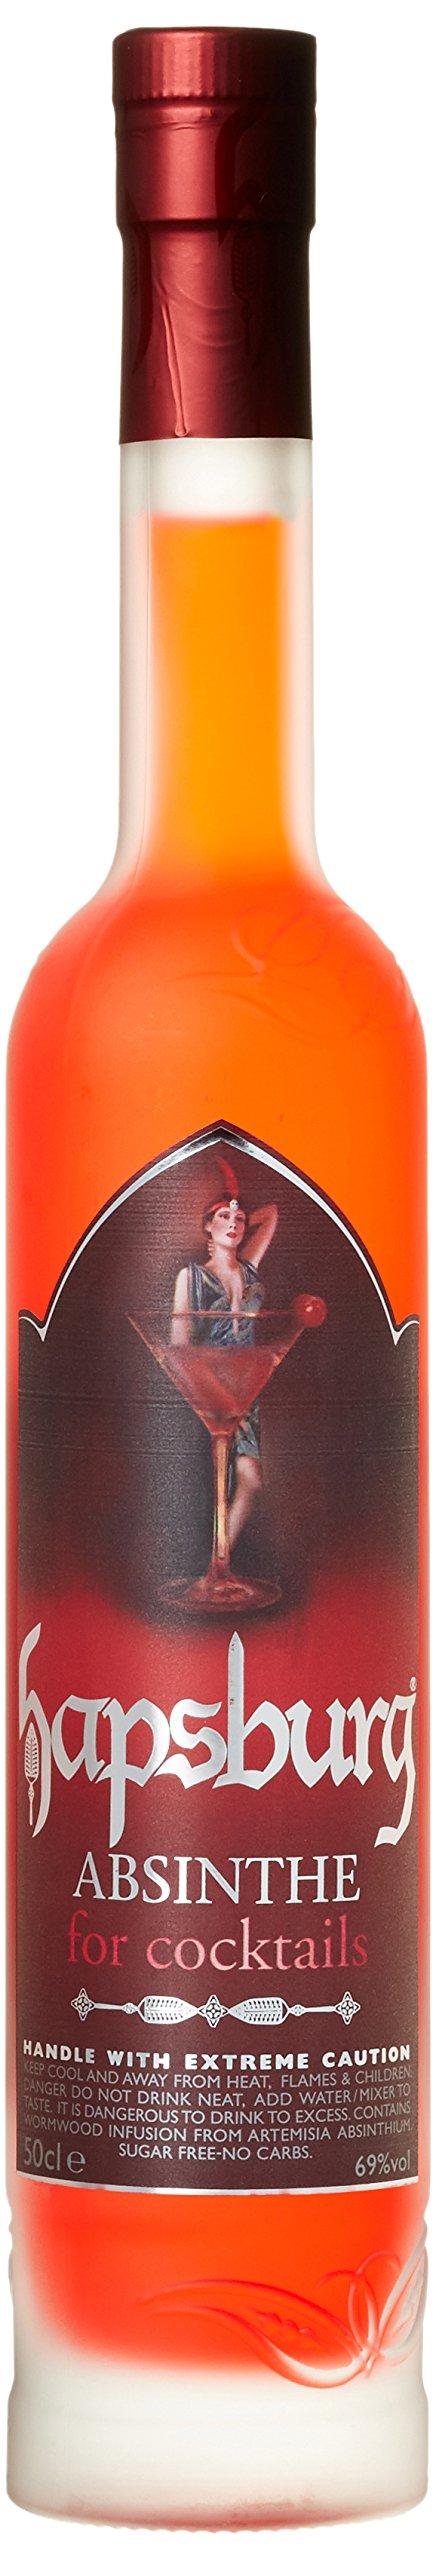 Hapsburg-Red-Label-Super-Deluxe-Absinthe-1-x-05-l